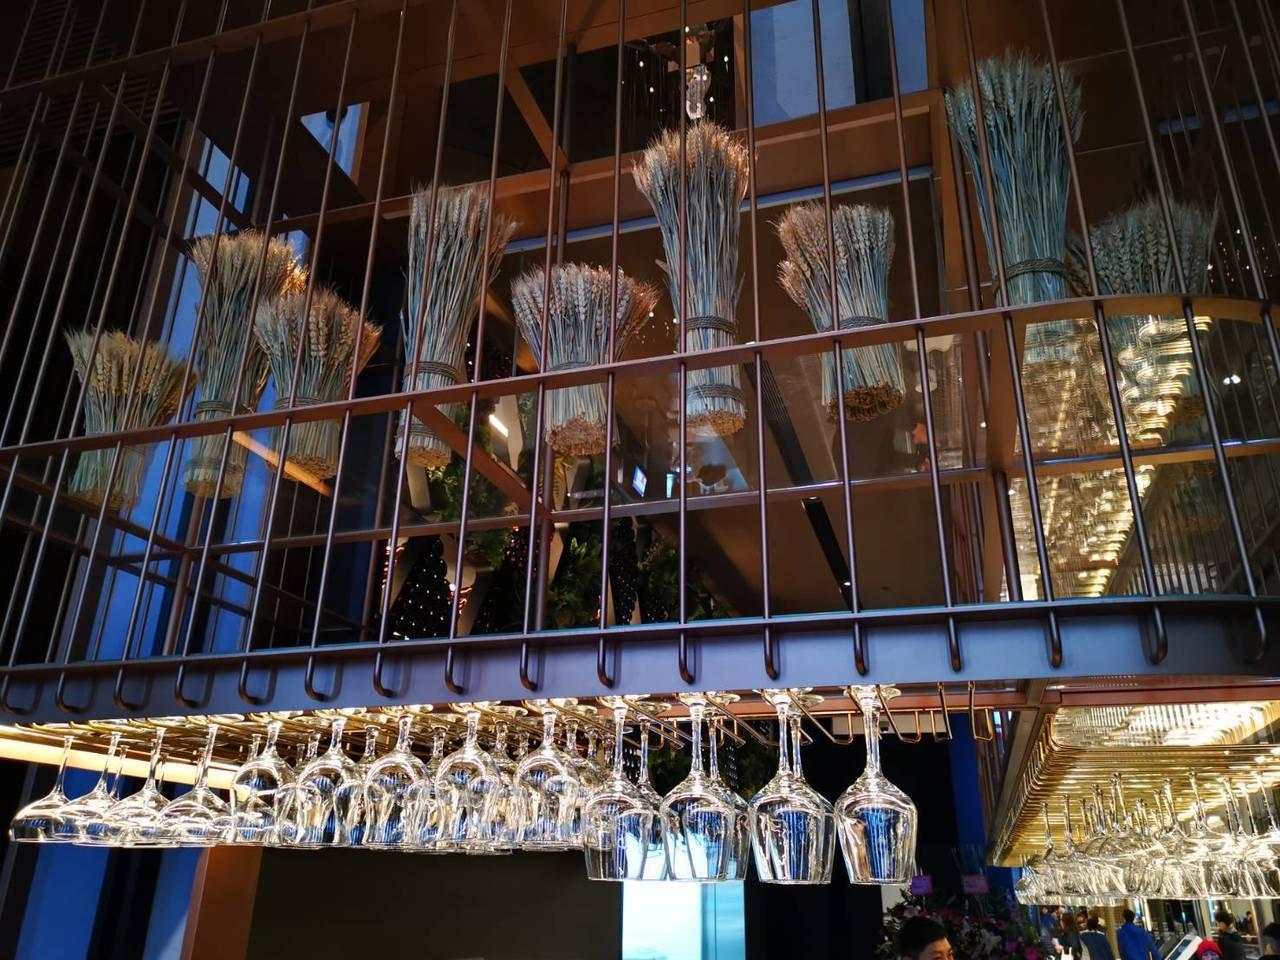 UMAMI室內設計頗具特色,在空中懸吊麥子,作為「金色三麥」的象徵。記者韓化宇/...